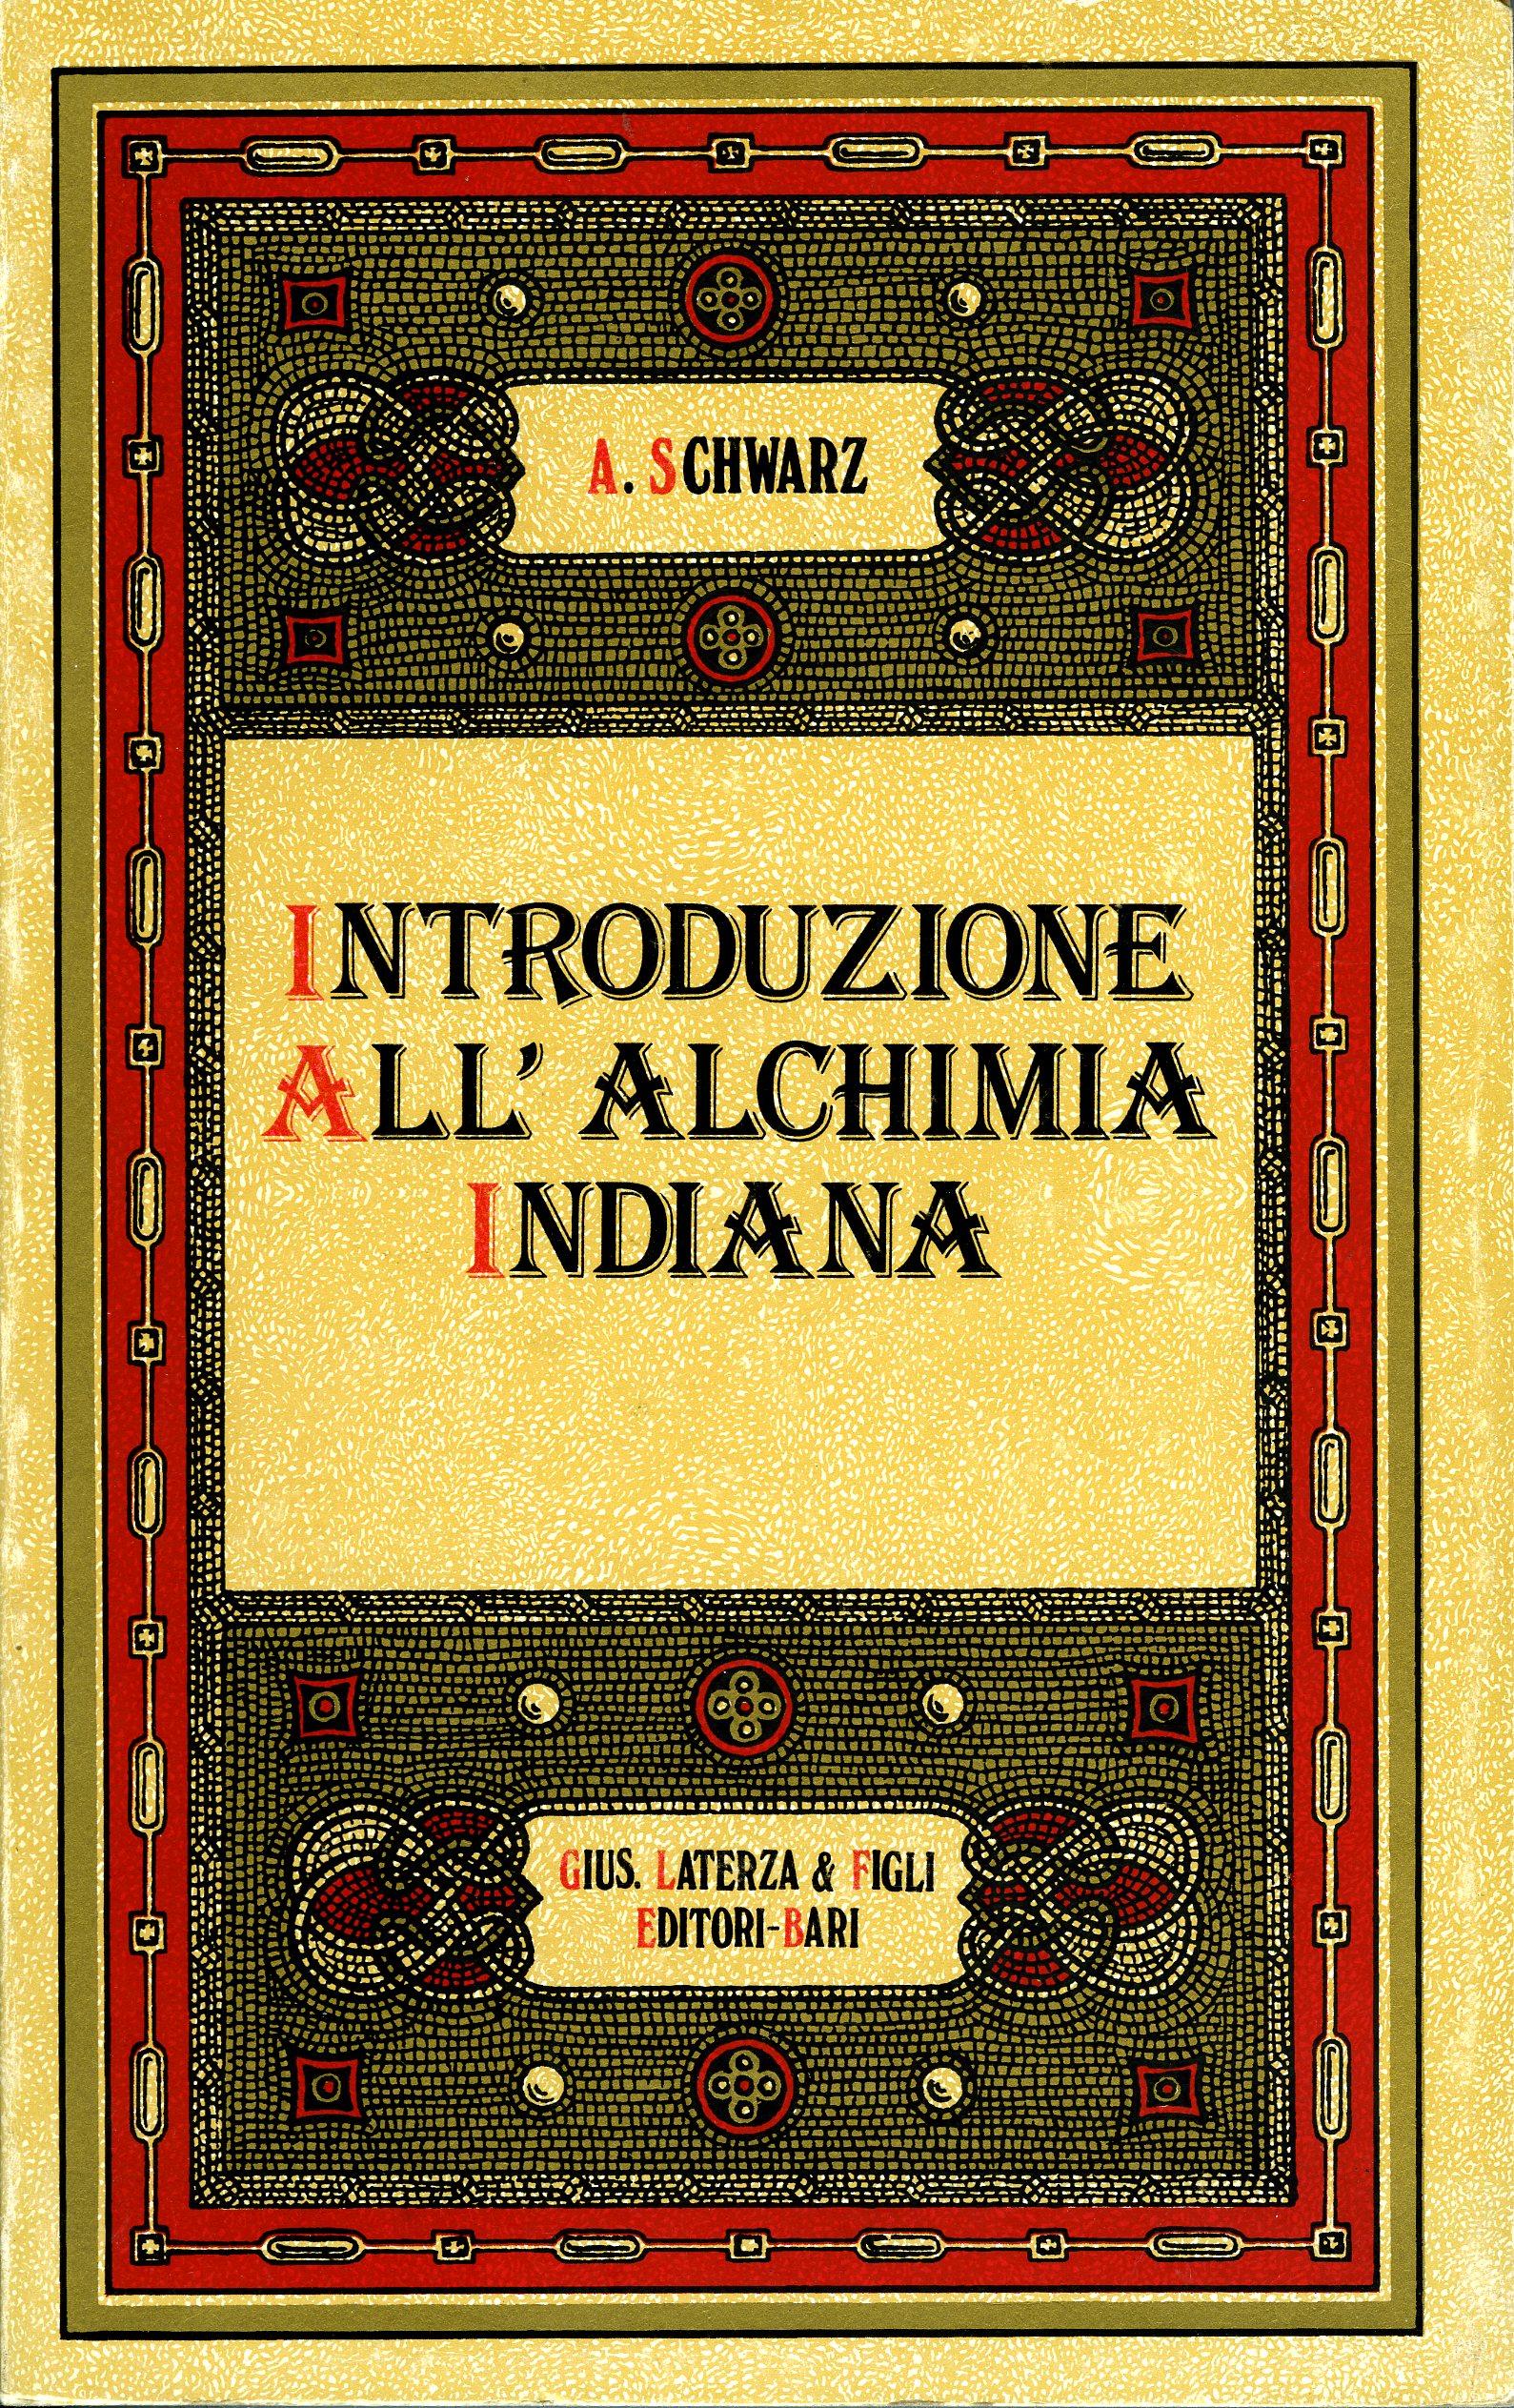 Introduzione all'alchimia indiana